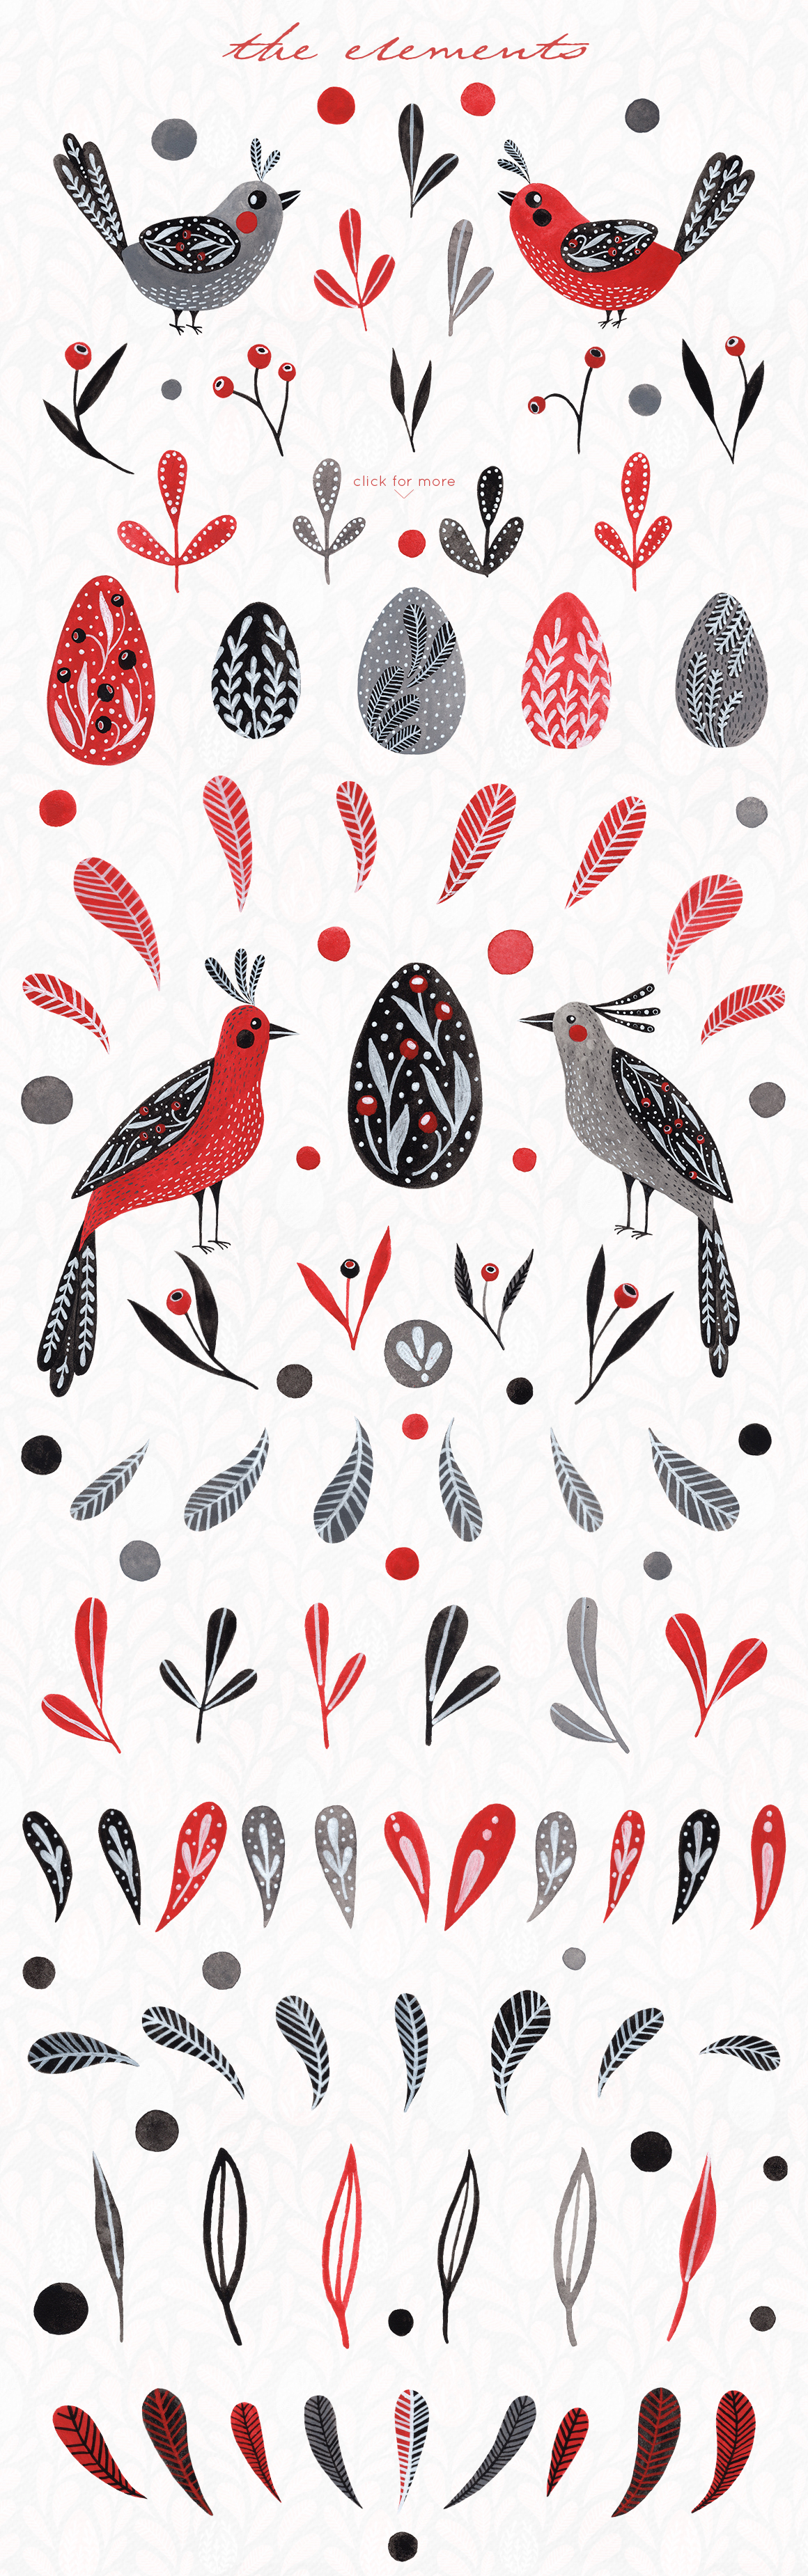 Lovebirds folk art bird illustrated collection example image 11